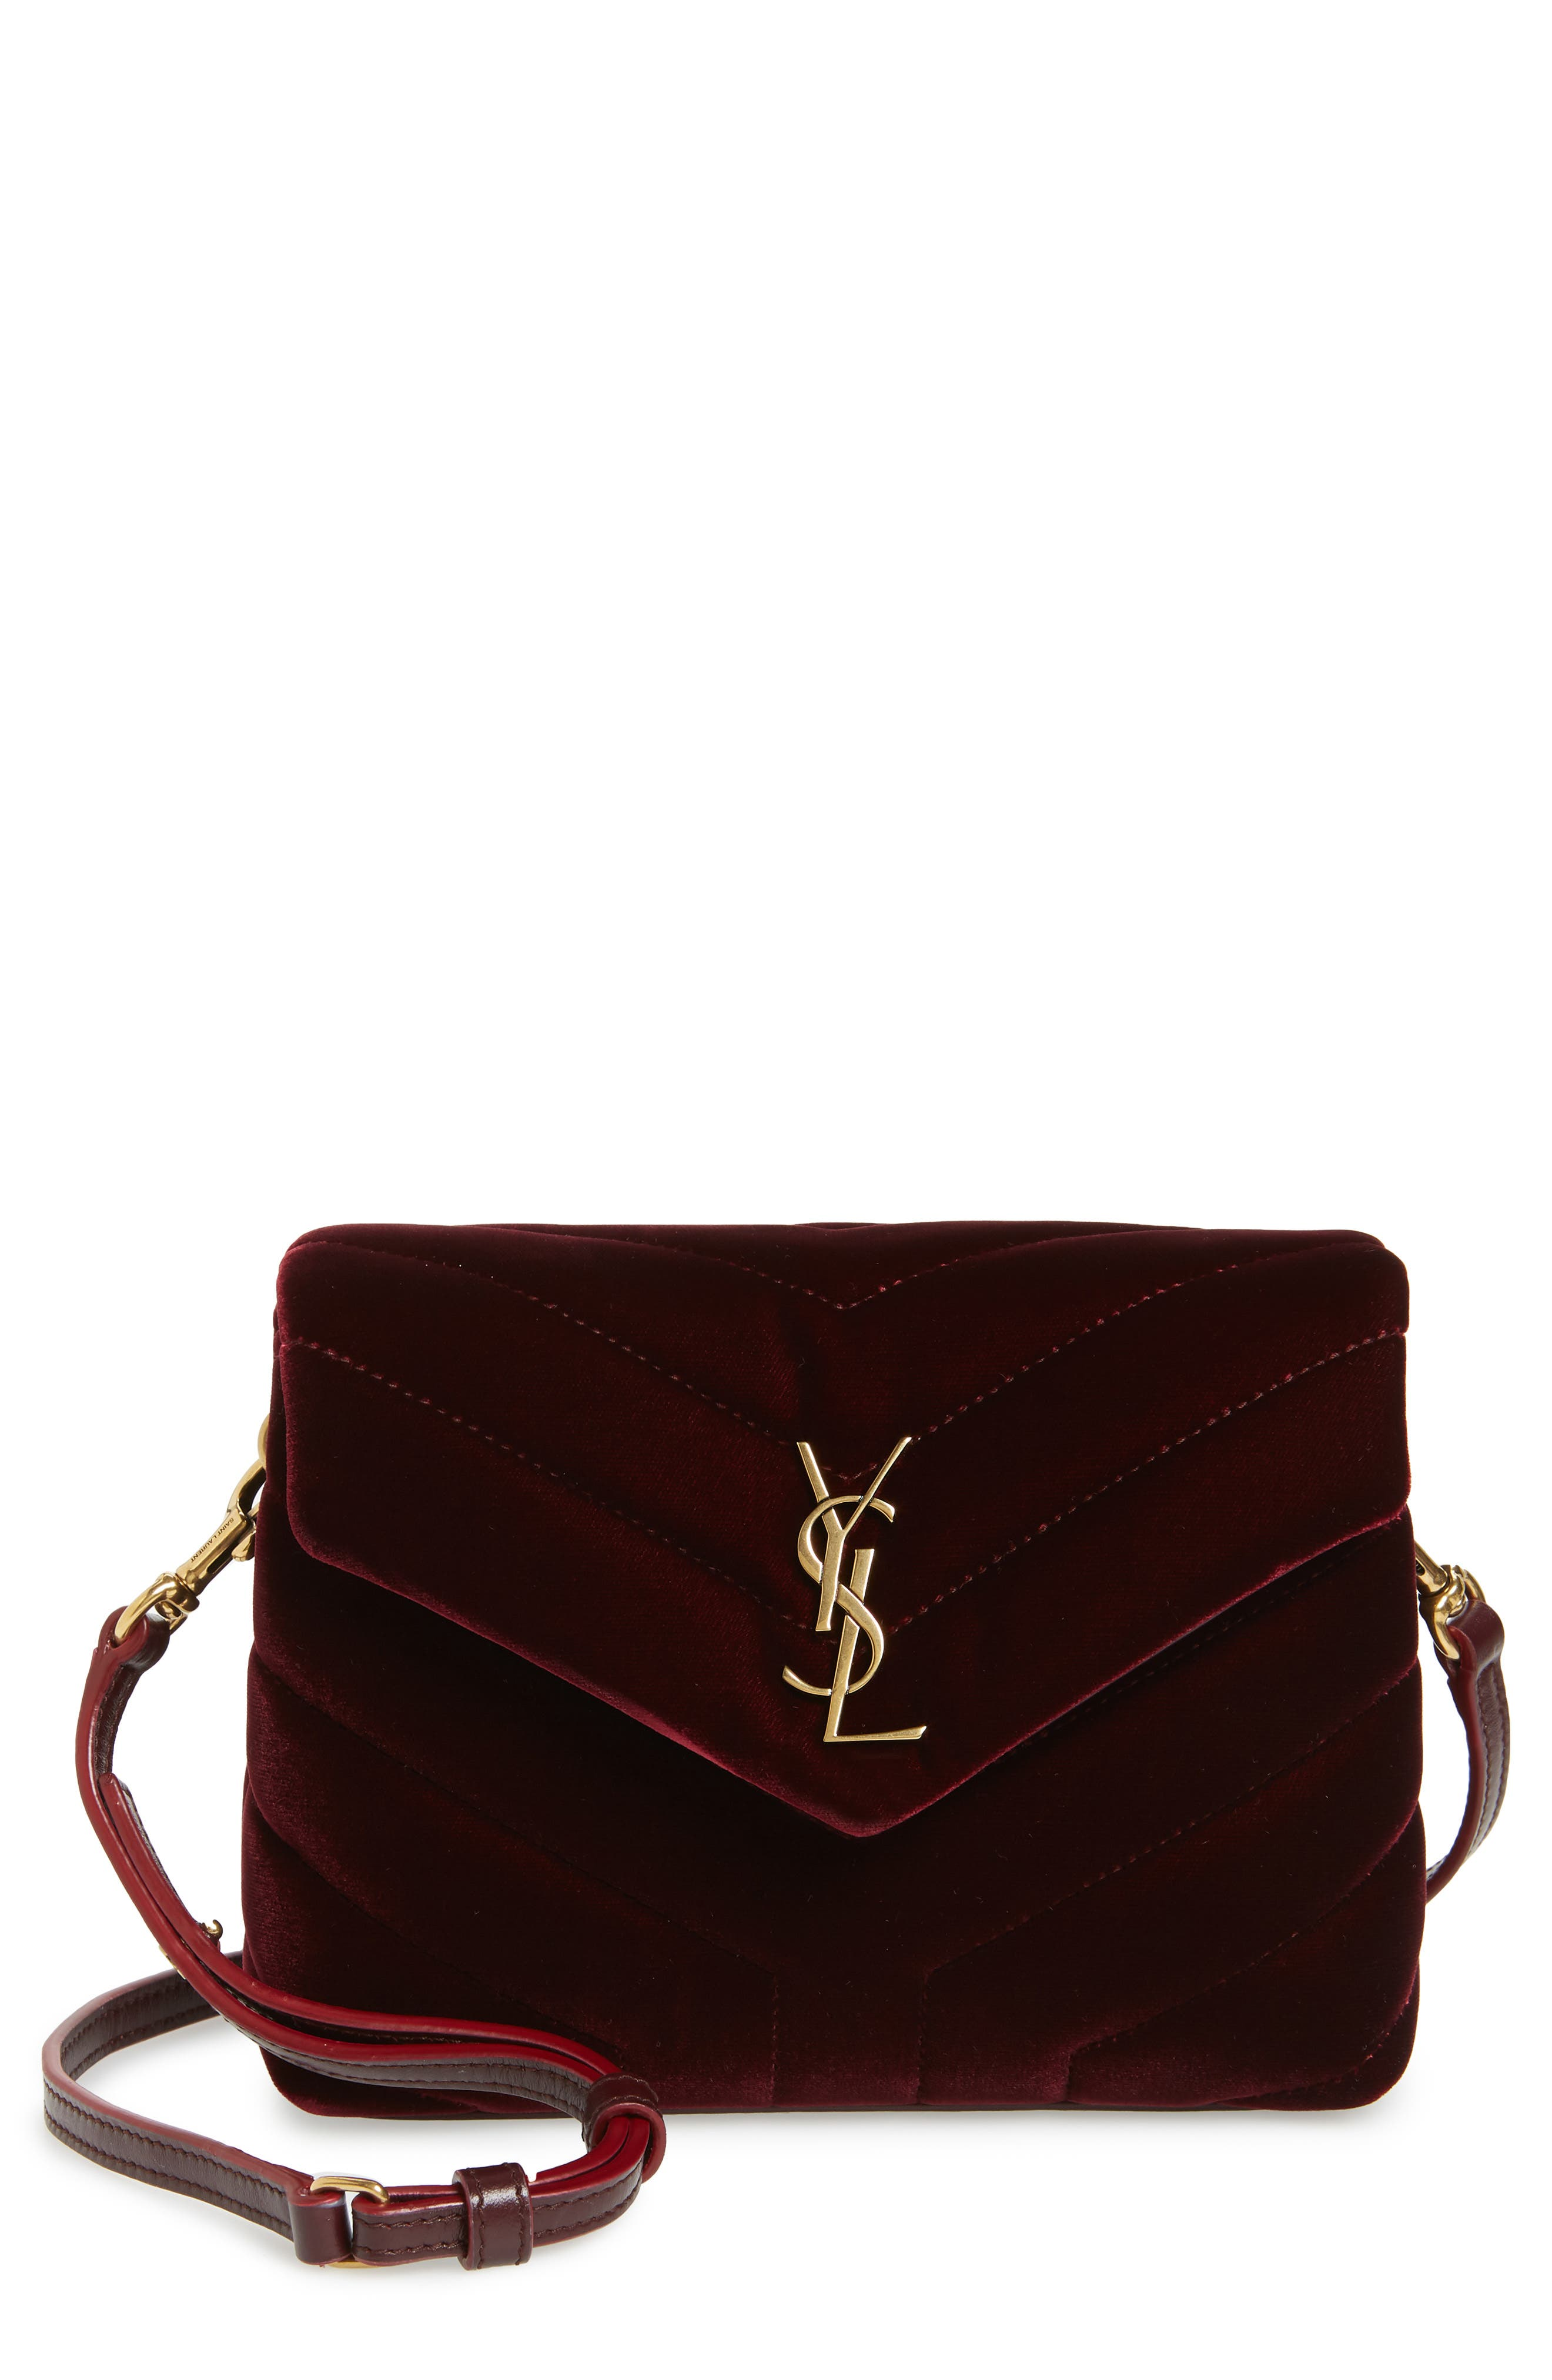 Toy Loulou Velvet Crossbody Bag,                         Main,                         color, 930